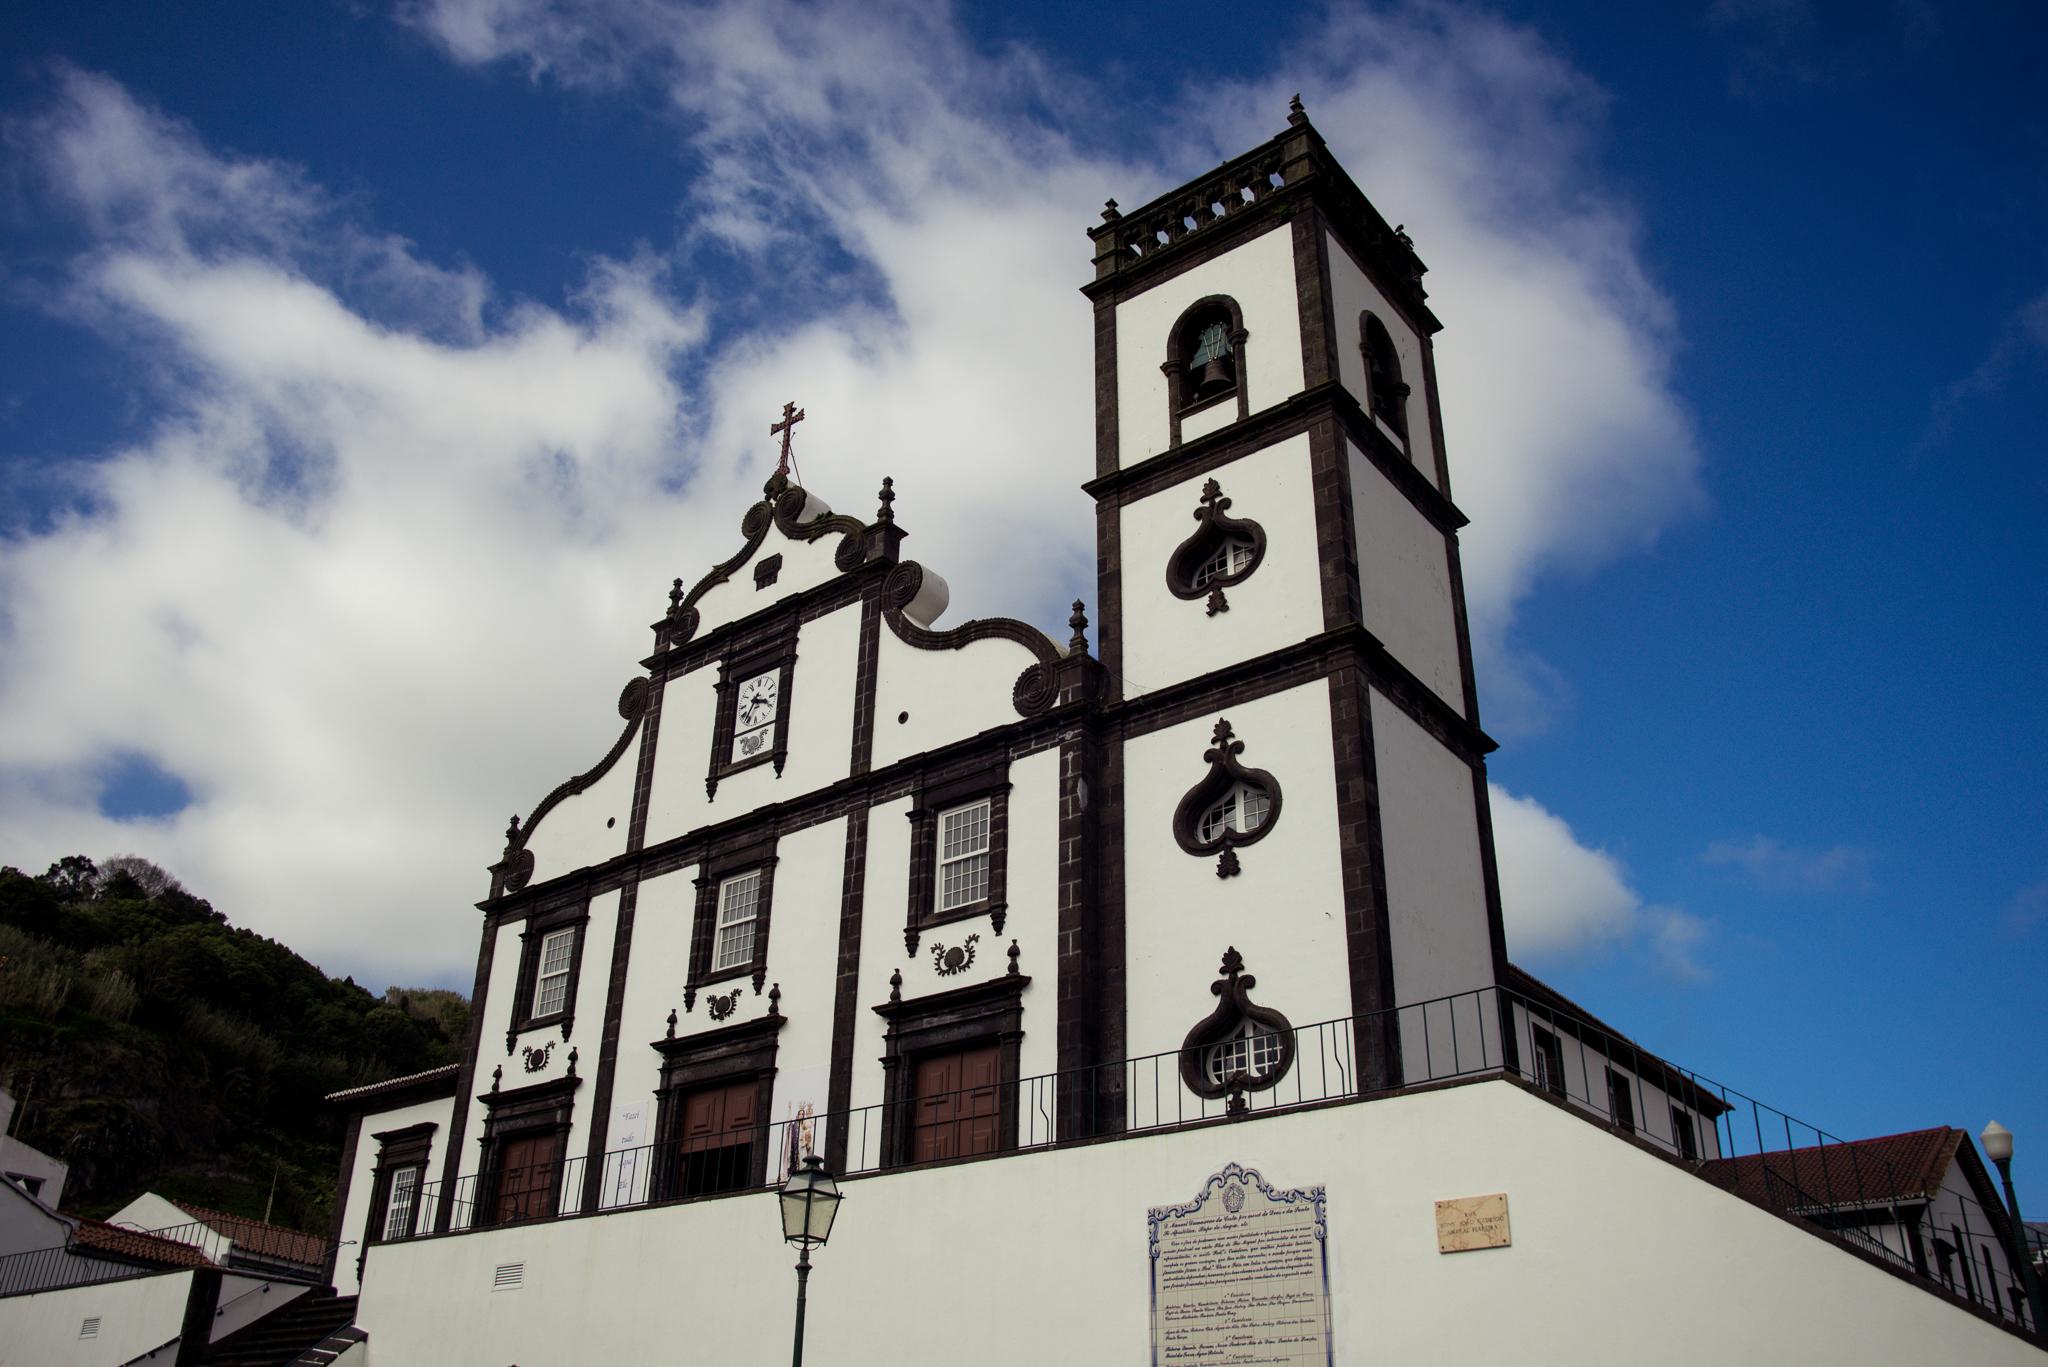 Povoacao tipikus azori stílusú temploma